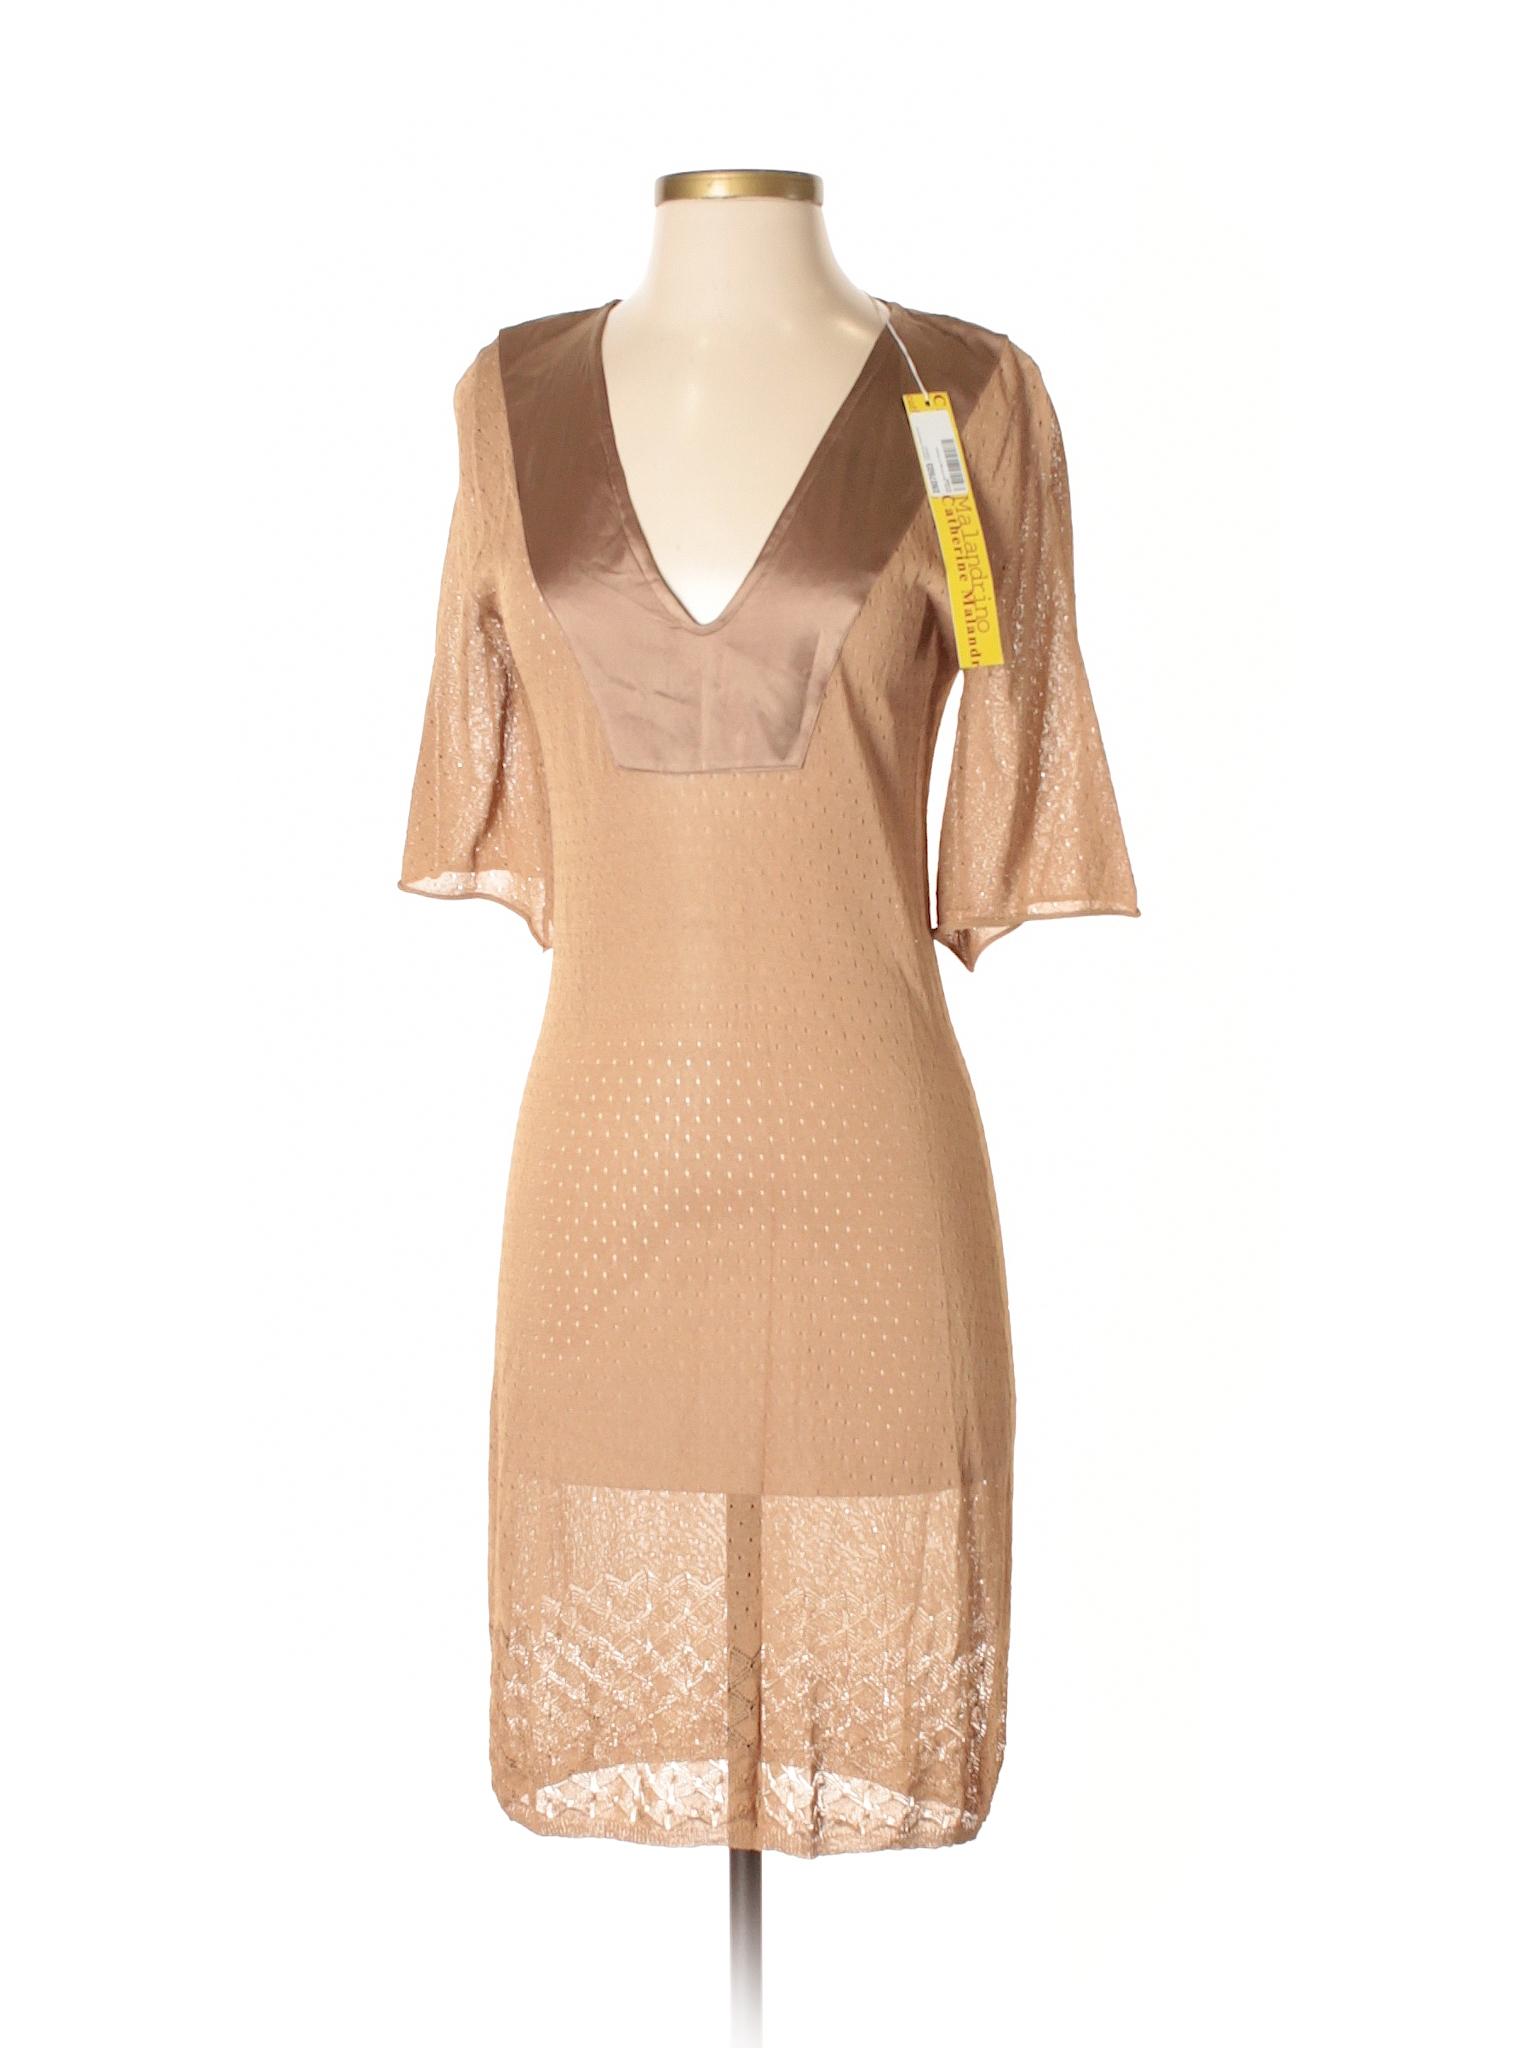 Catherine Malandrino Selling Dress Catherine Selling Casual Malandrino Casual Malandrino Dress Casual Selling Selling Dress Catherine Pq40A